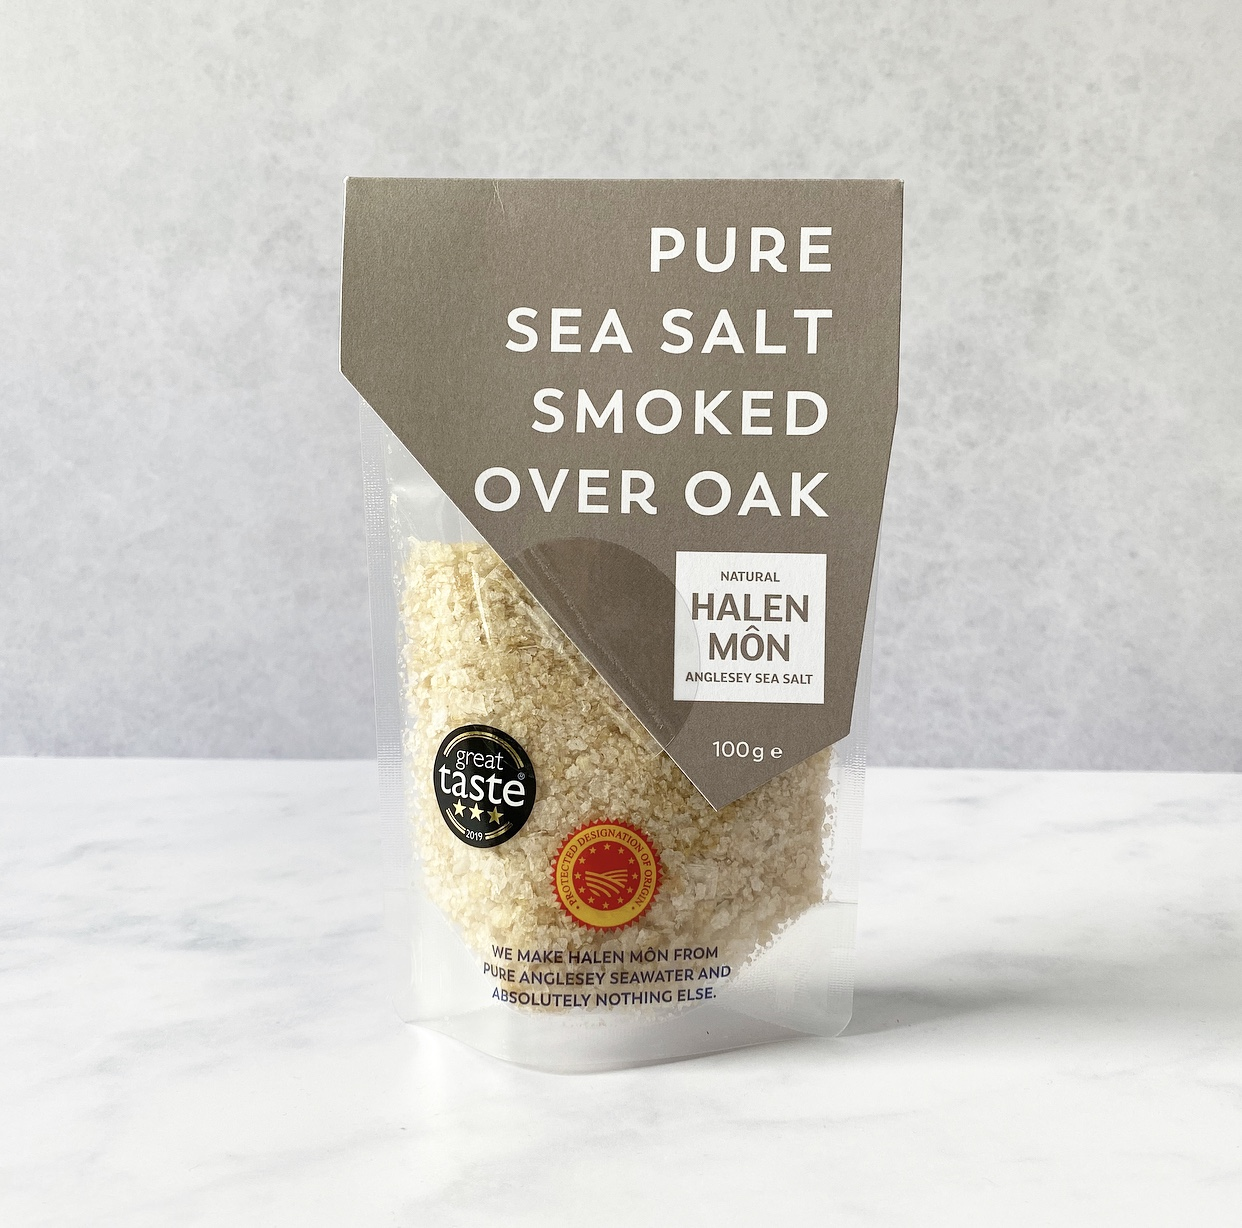 Halen Môn Pure Sea Salt Smoked Over Oak